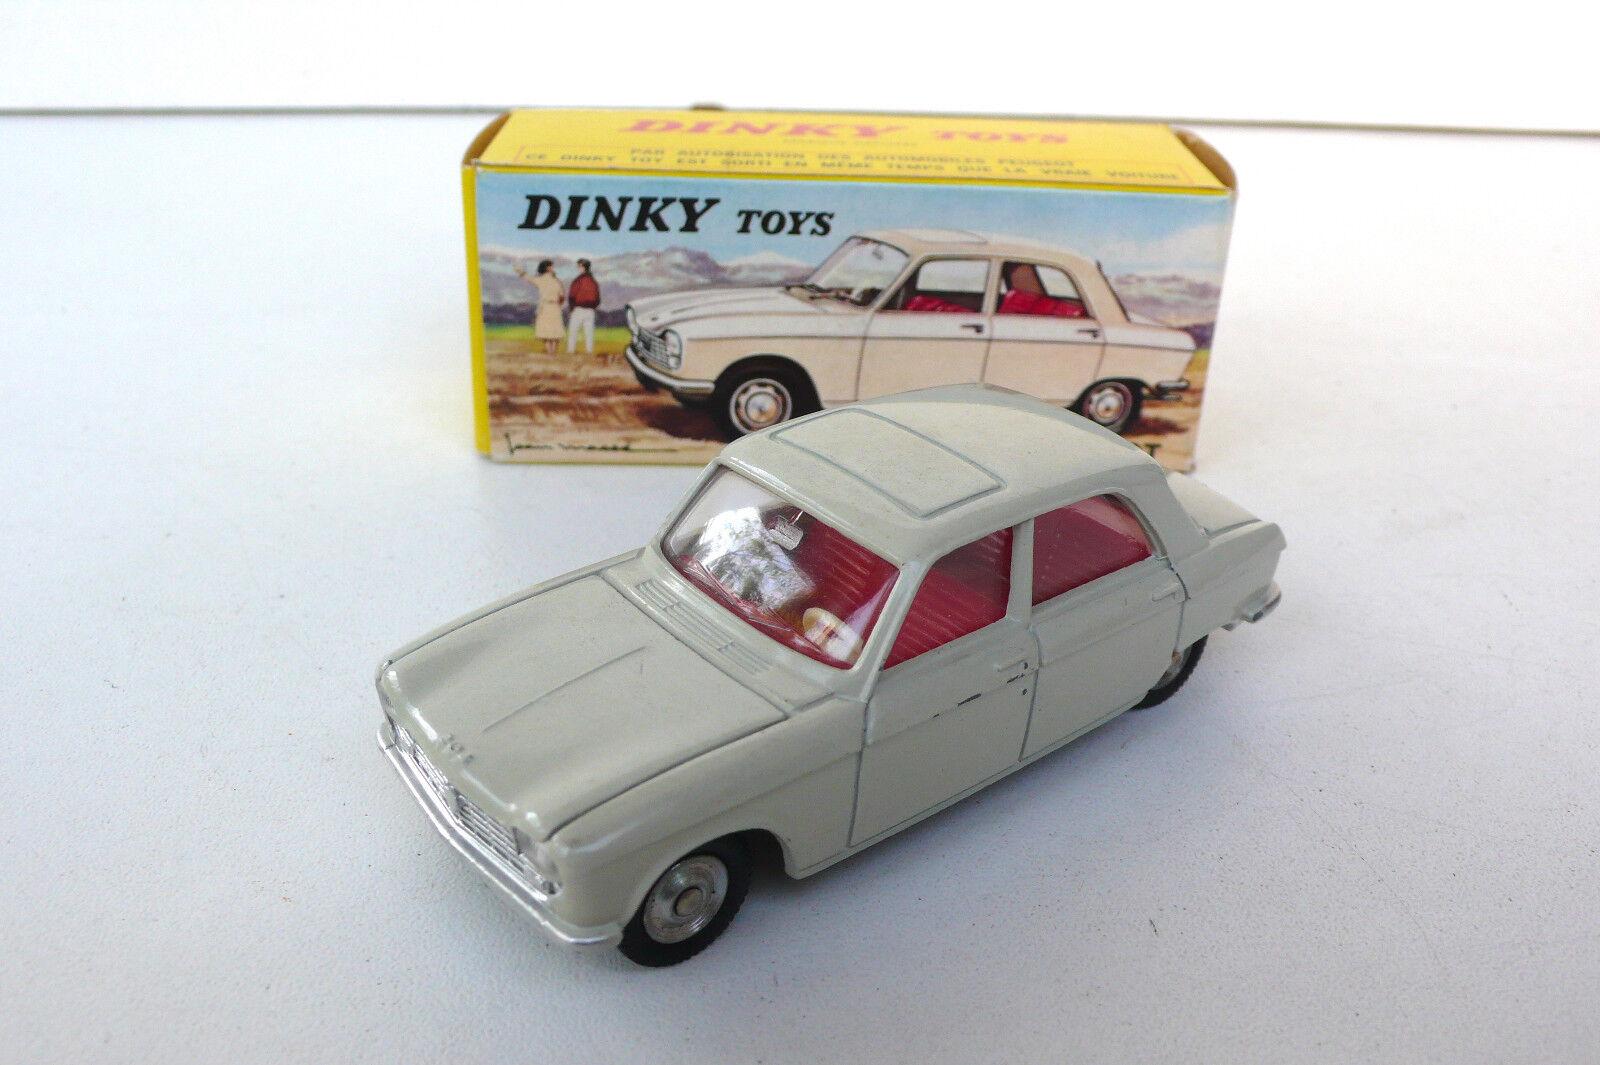 encuentra tu favorito aquí DINKY DINKY DINKY TOYS   PEUGEOT 204   REF 510     TRÈS BON ÉTAT     BOITE D'ORIGINE  1965  venta caliente